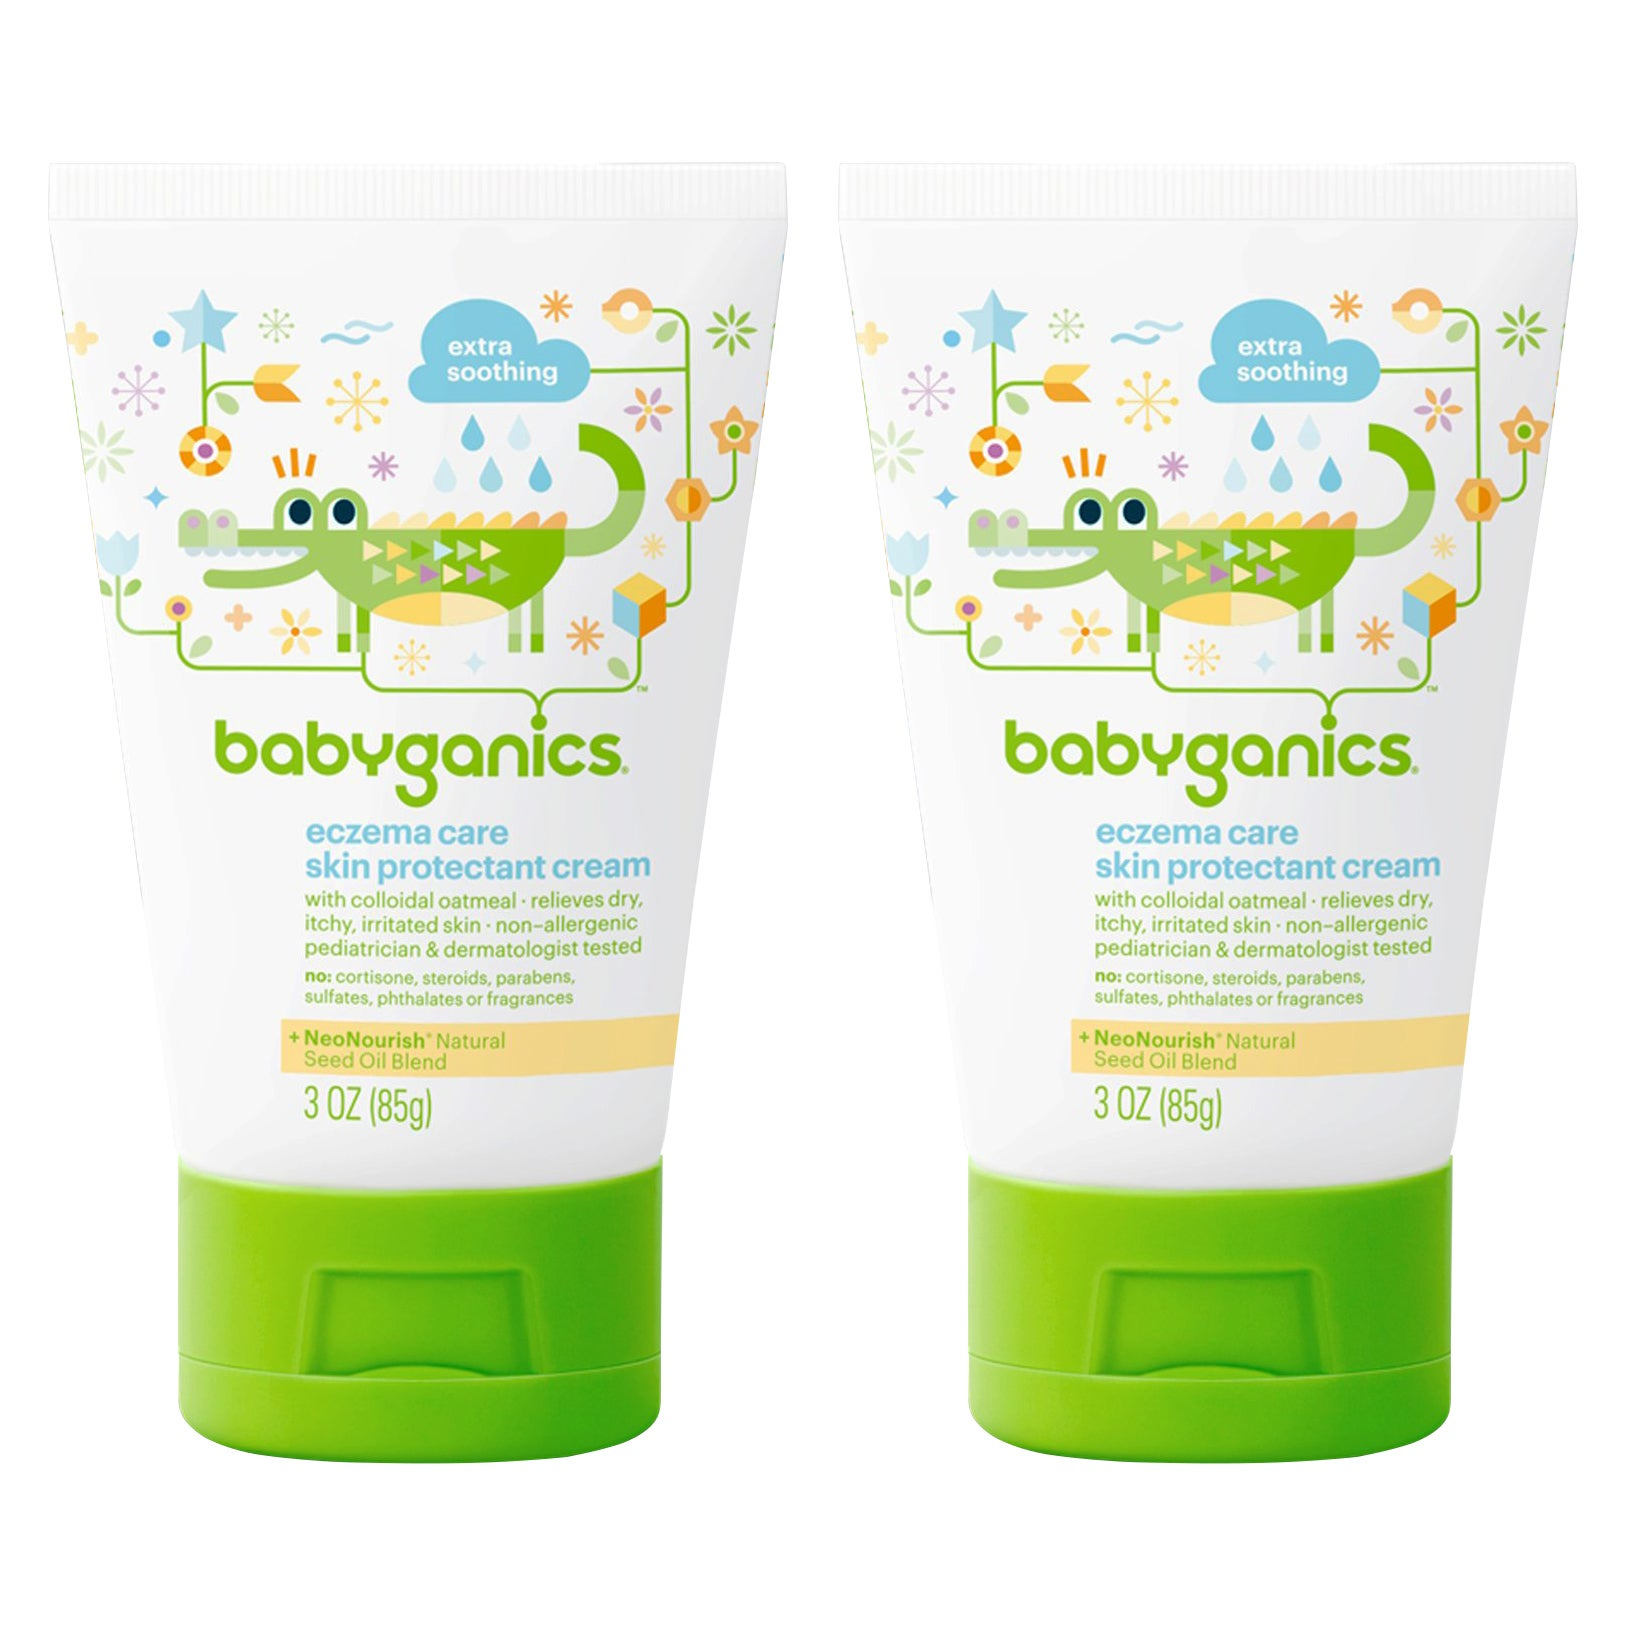 BabyGanics Eczema Care Skin Protectant Cream, 3 oz (2- Co...